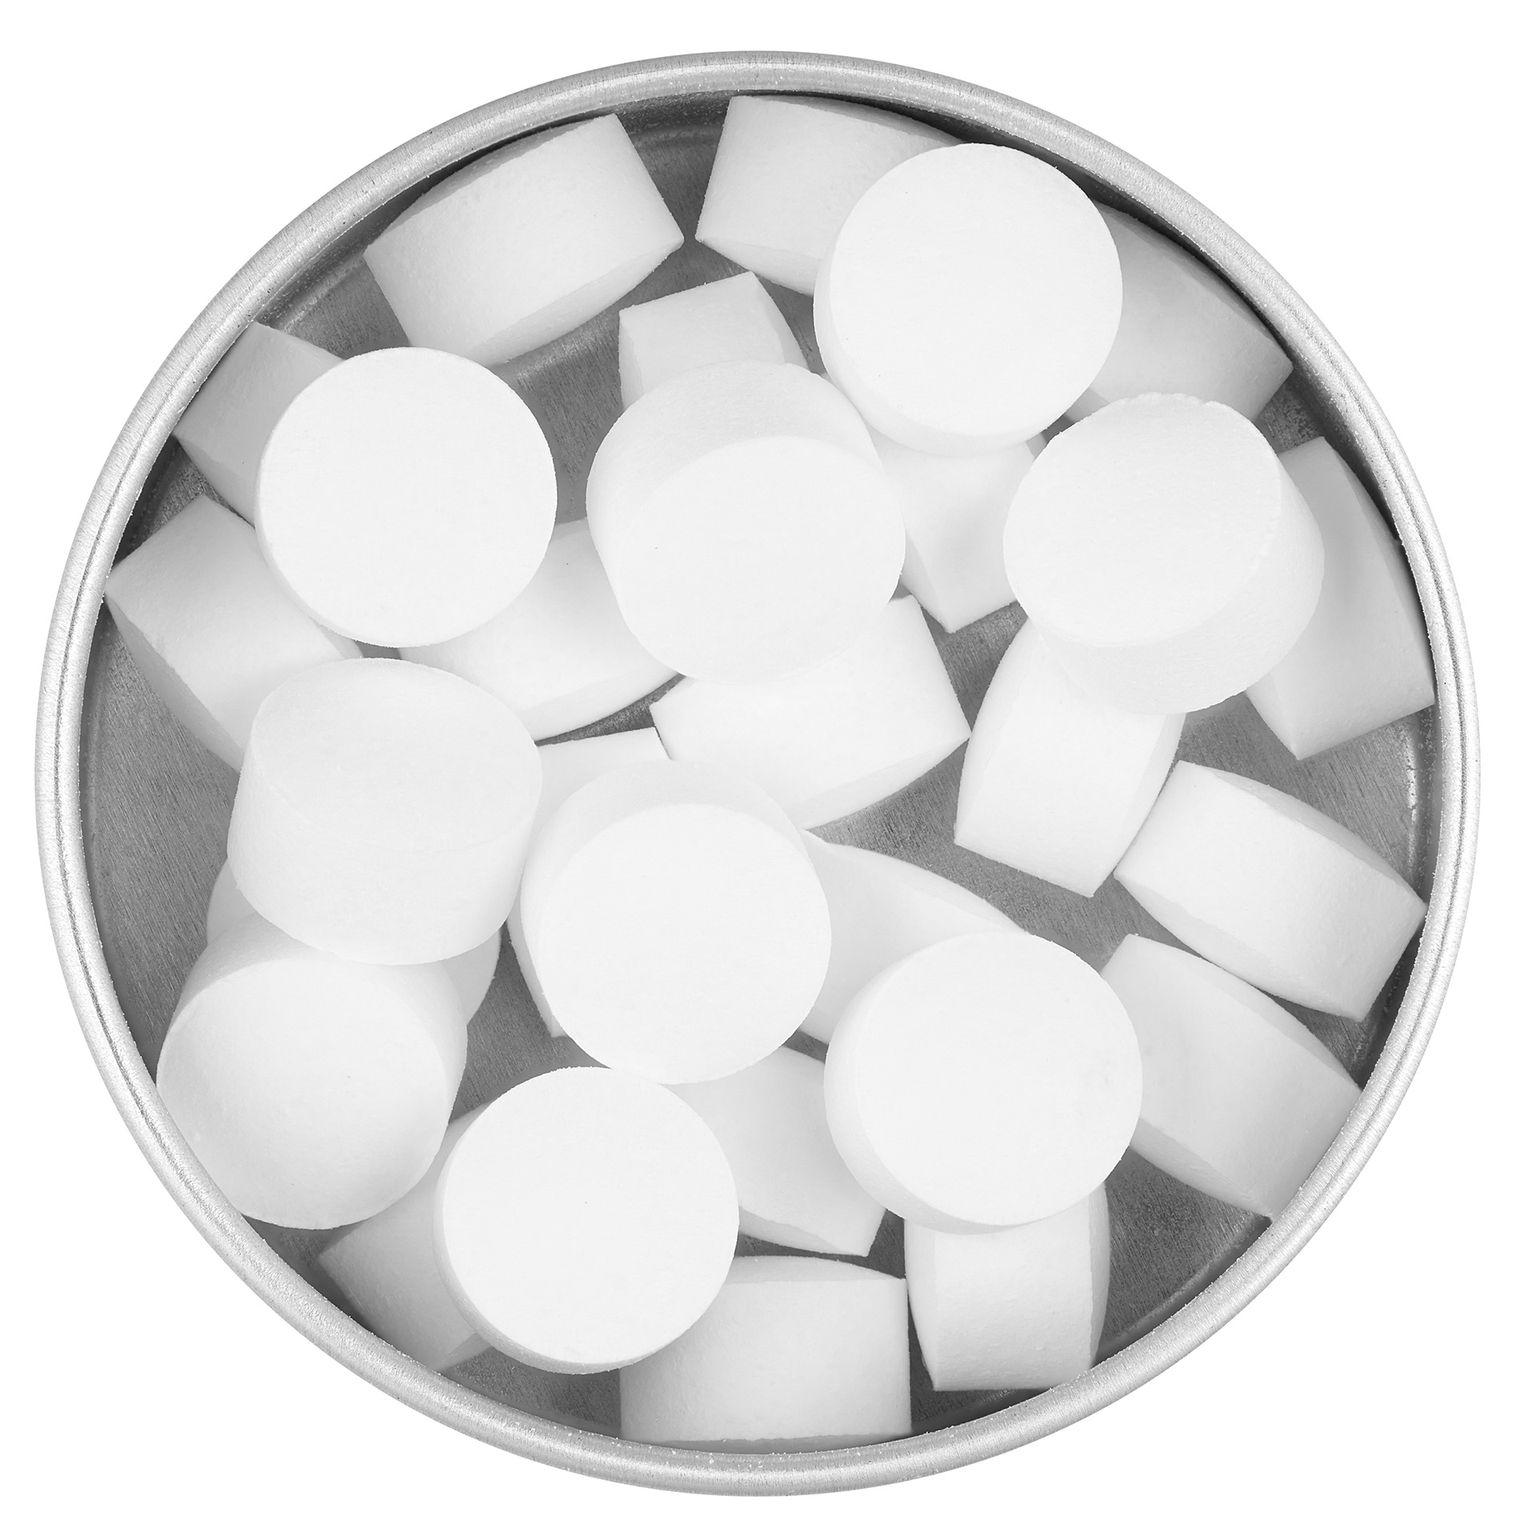 Mini bonbons á la menthe - Aluminium Recyclé